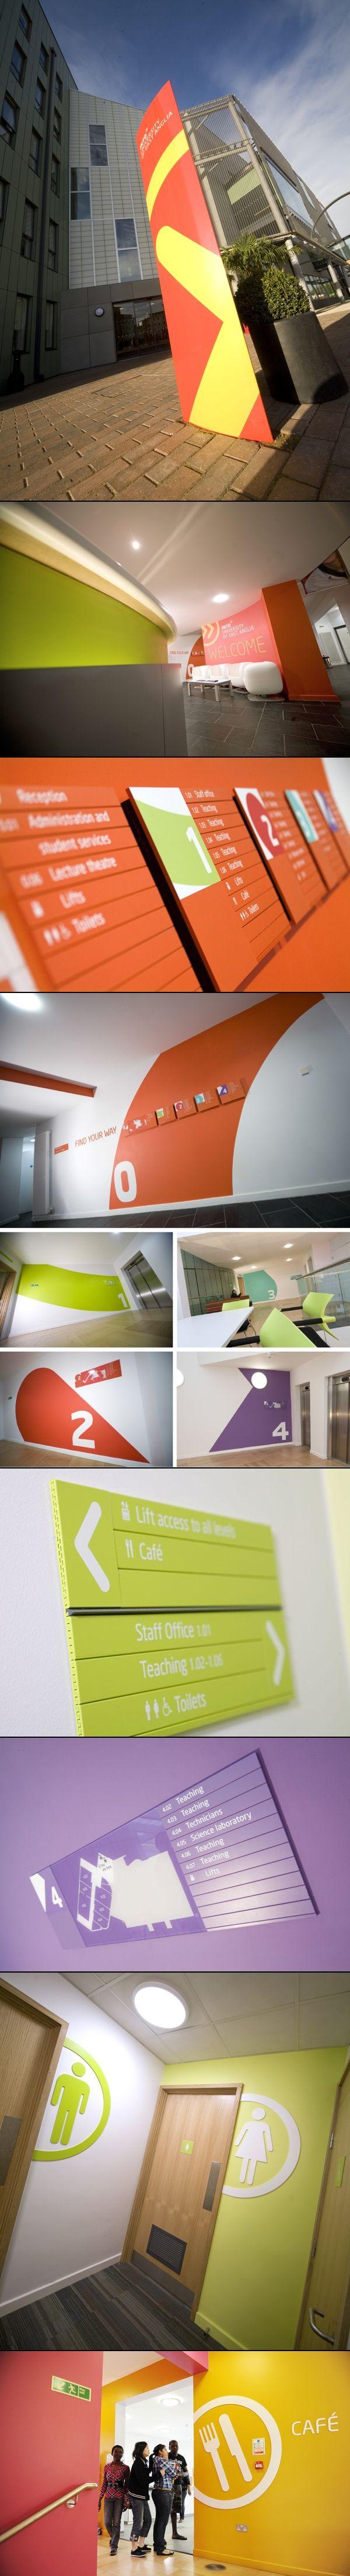 INTO University of East Anglia way-finding signage   Designer: Richard Wise